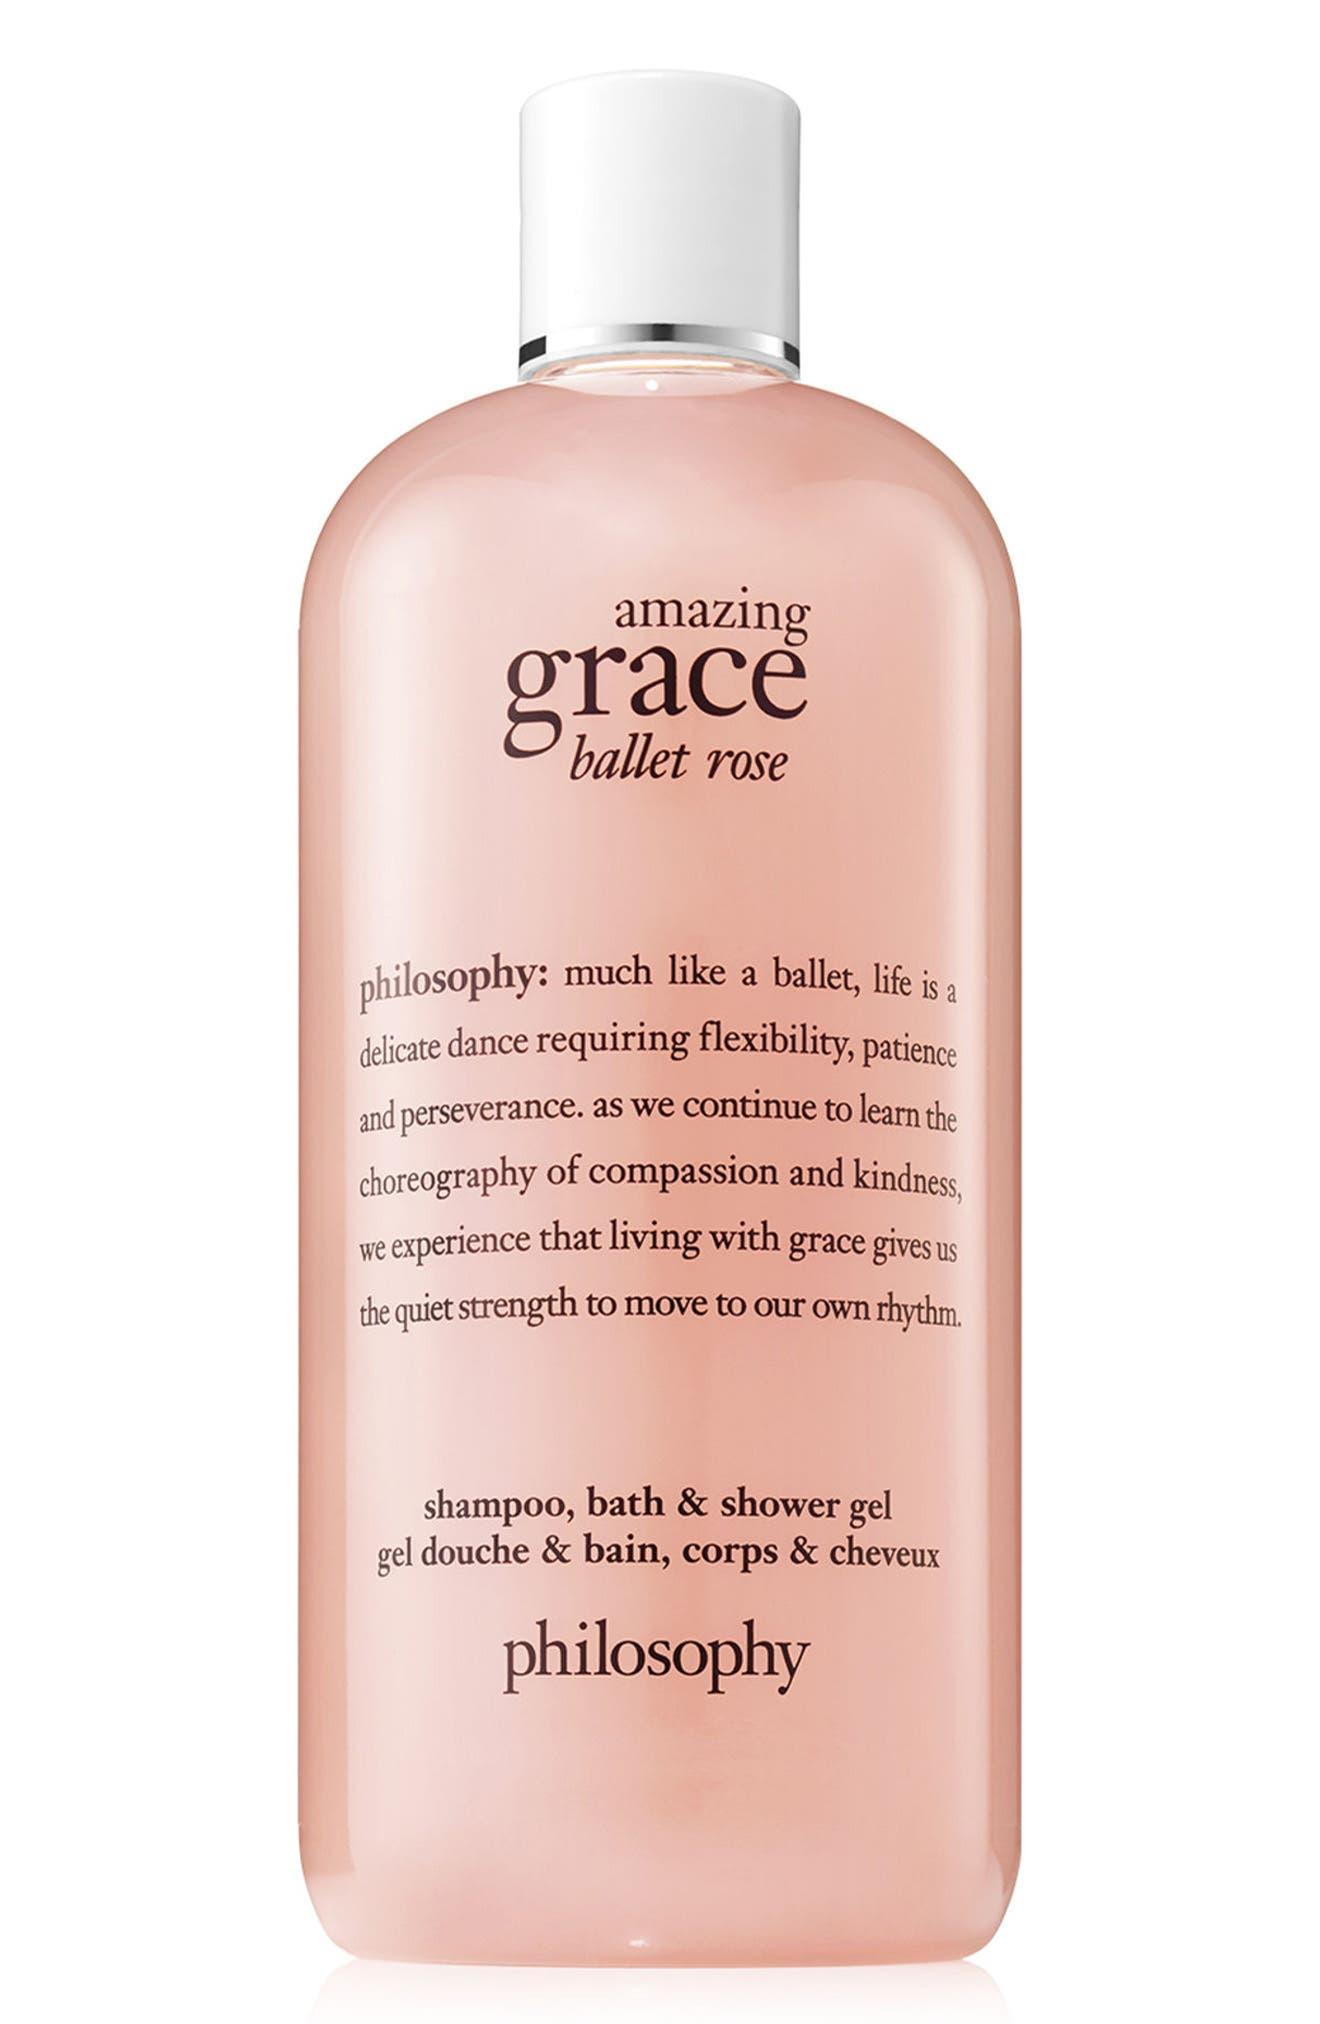 Main Image - philosophy amazing grace ballet rose shampoo, bath & shower gel